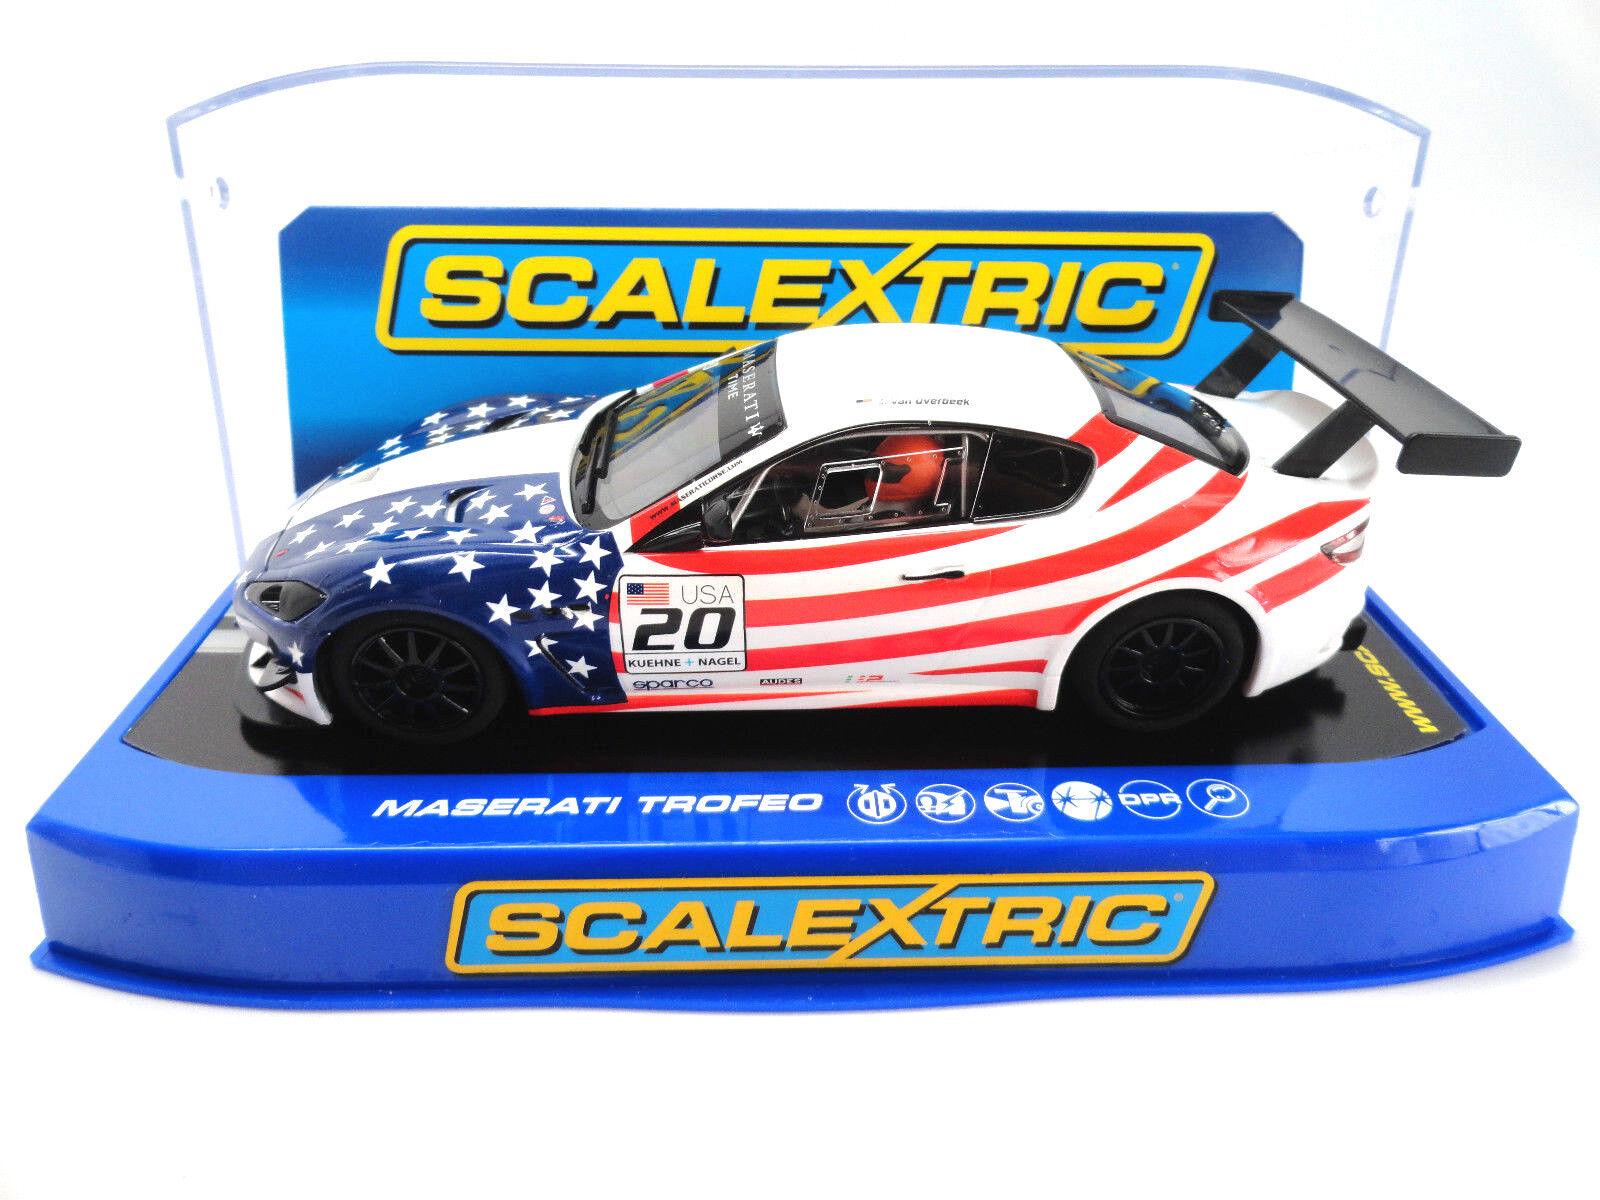 Scalextric  USA  Maserati Trofeo DPR W  Lights 1 32 Slot Car C3603